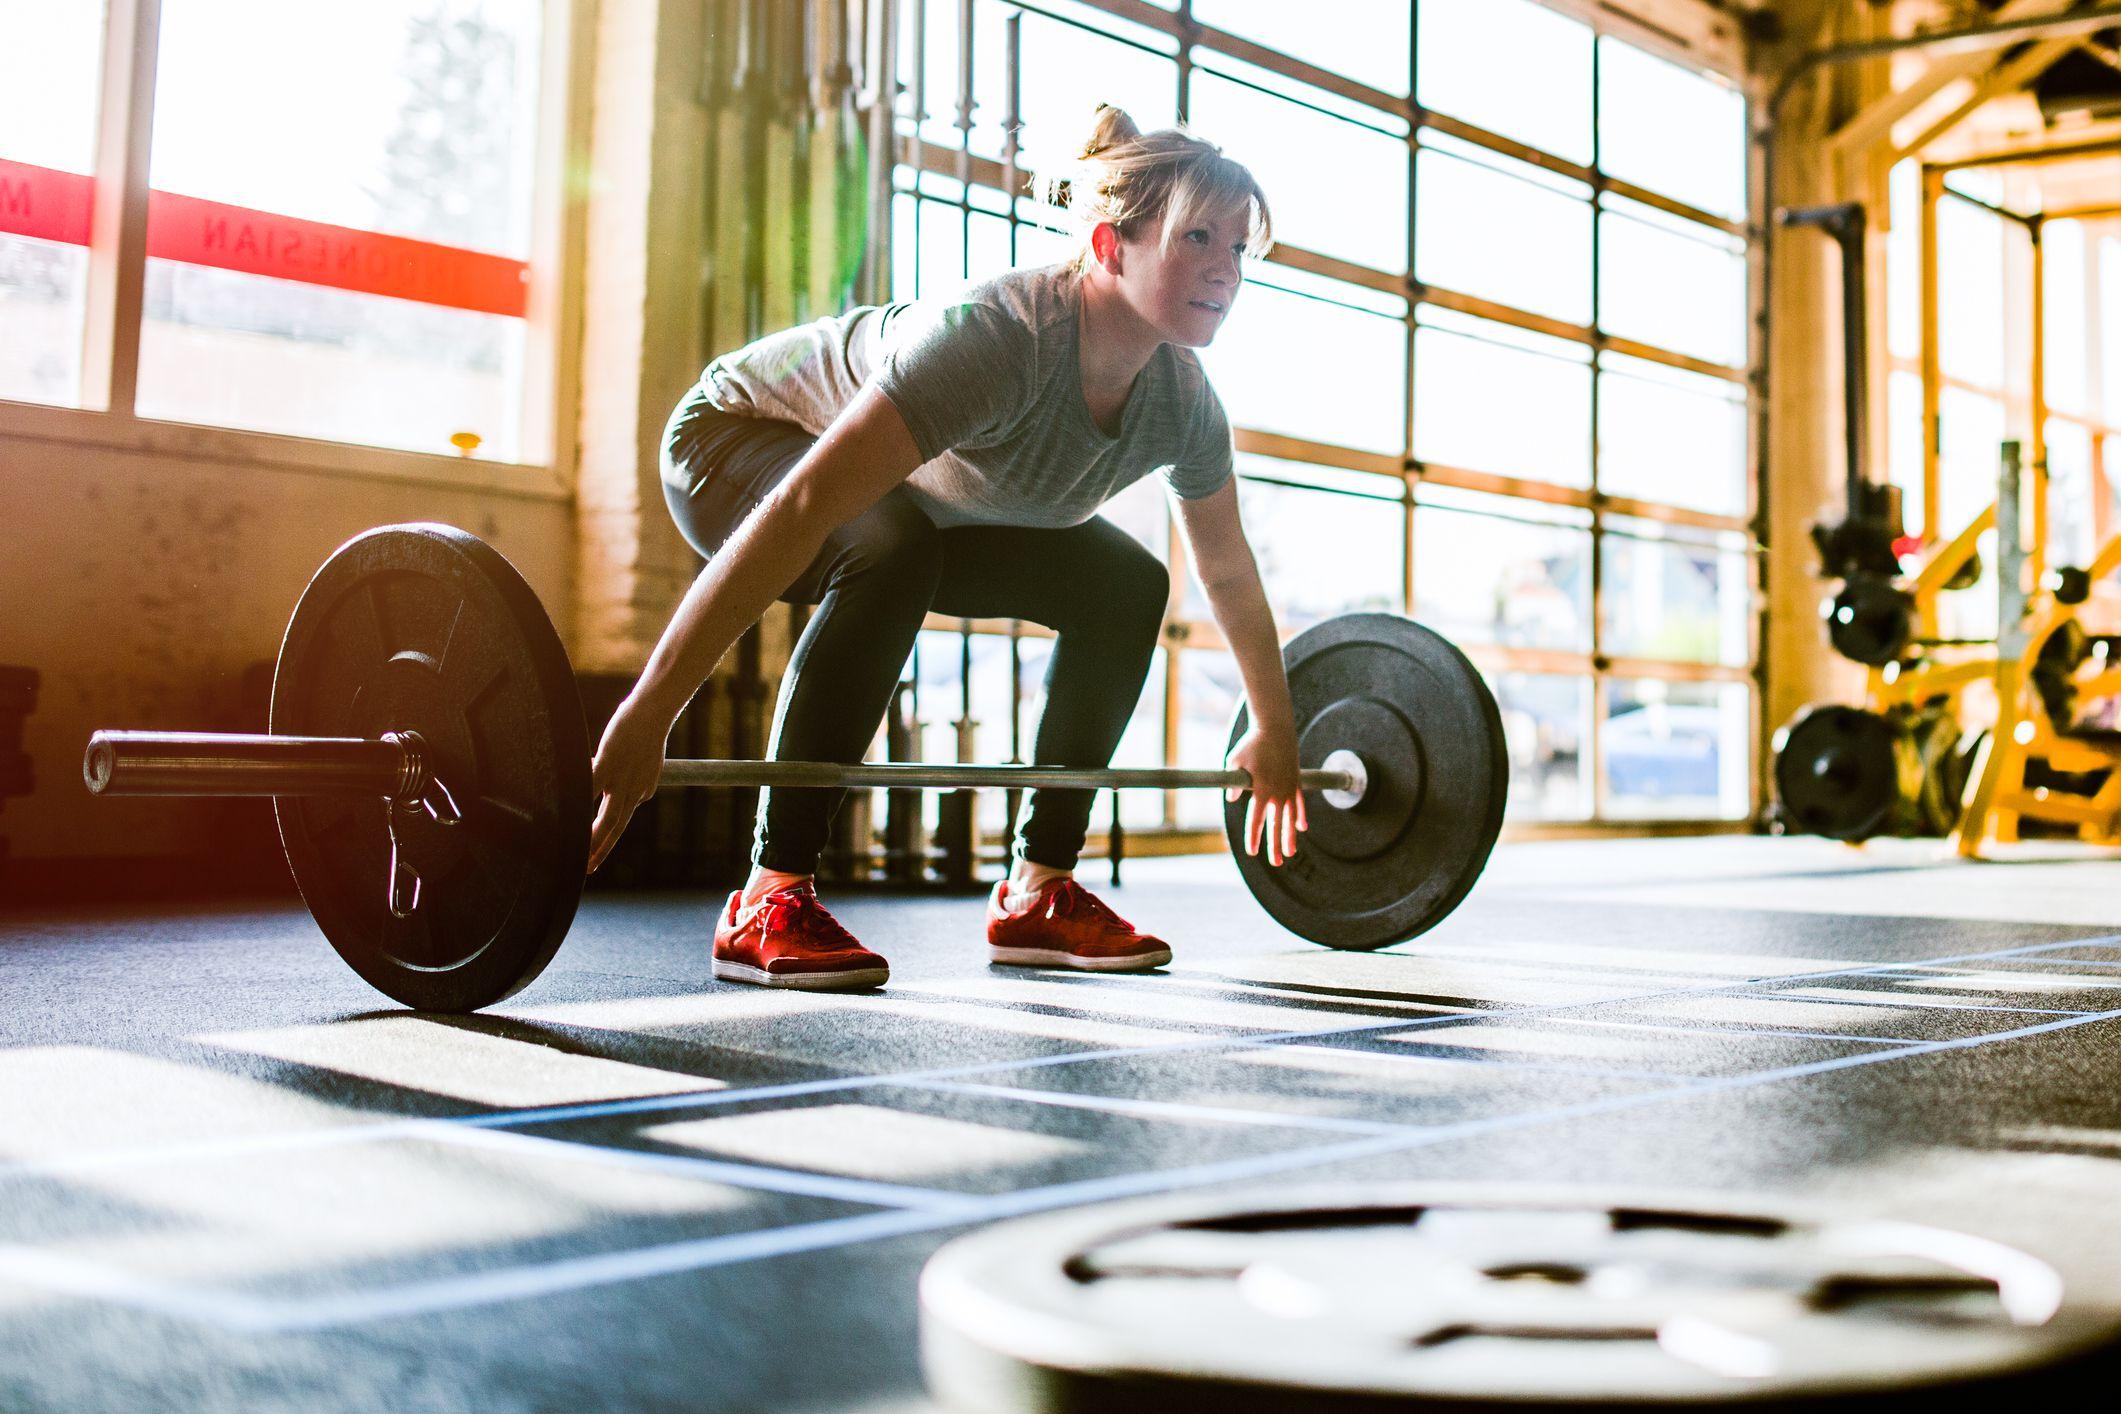 Lower Body Circuit Blast to Tone Your Legs